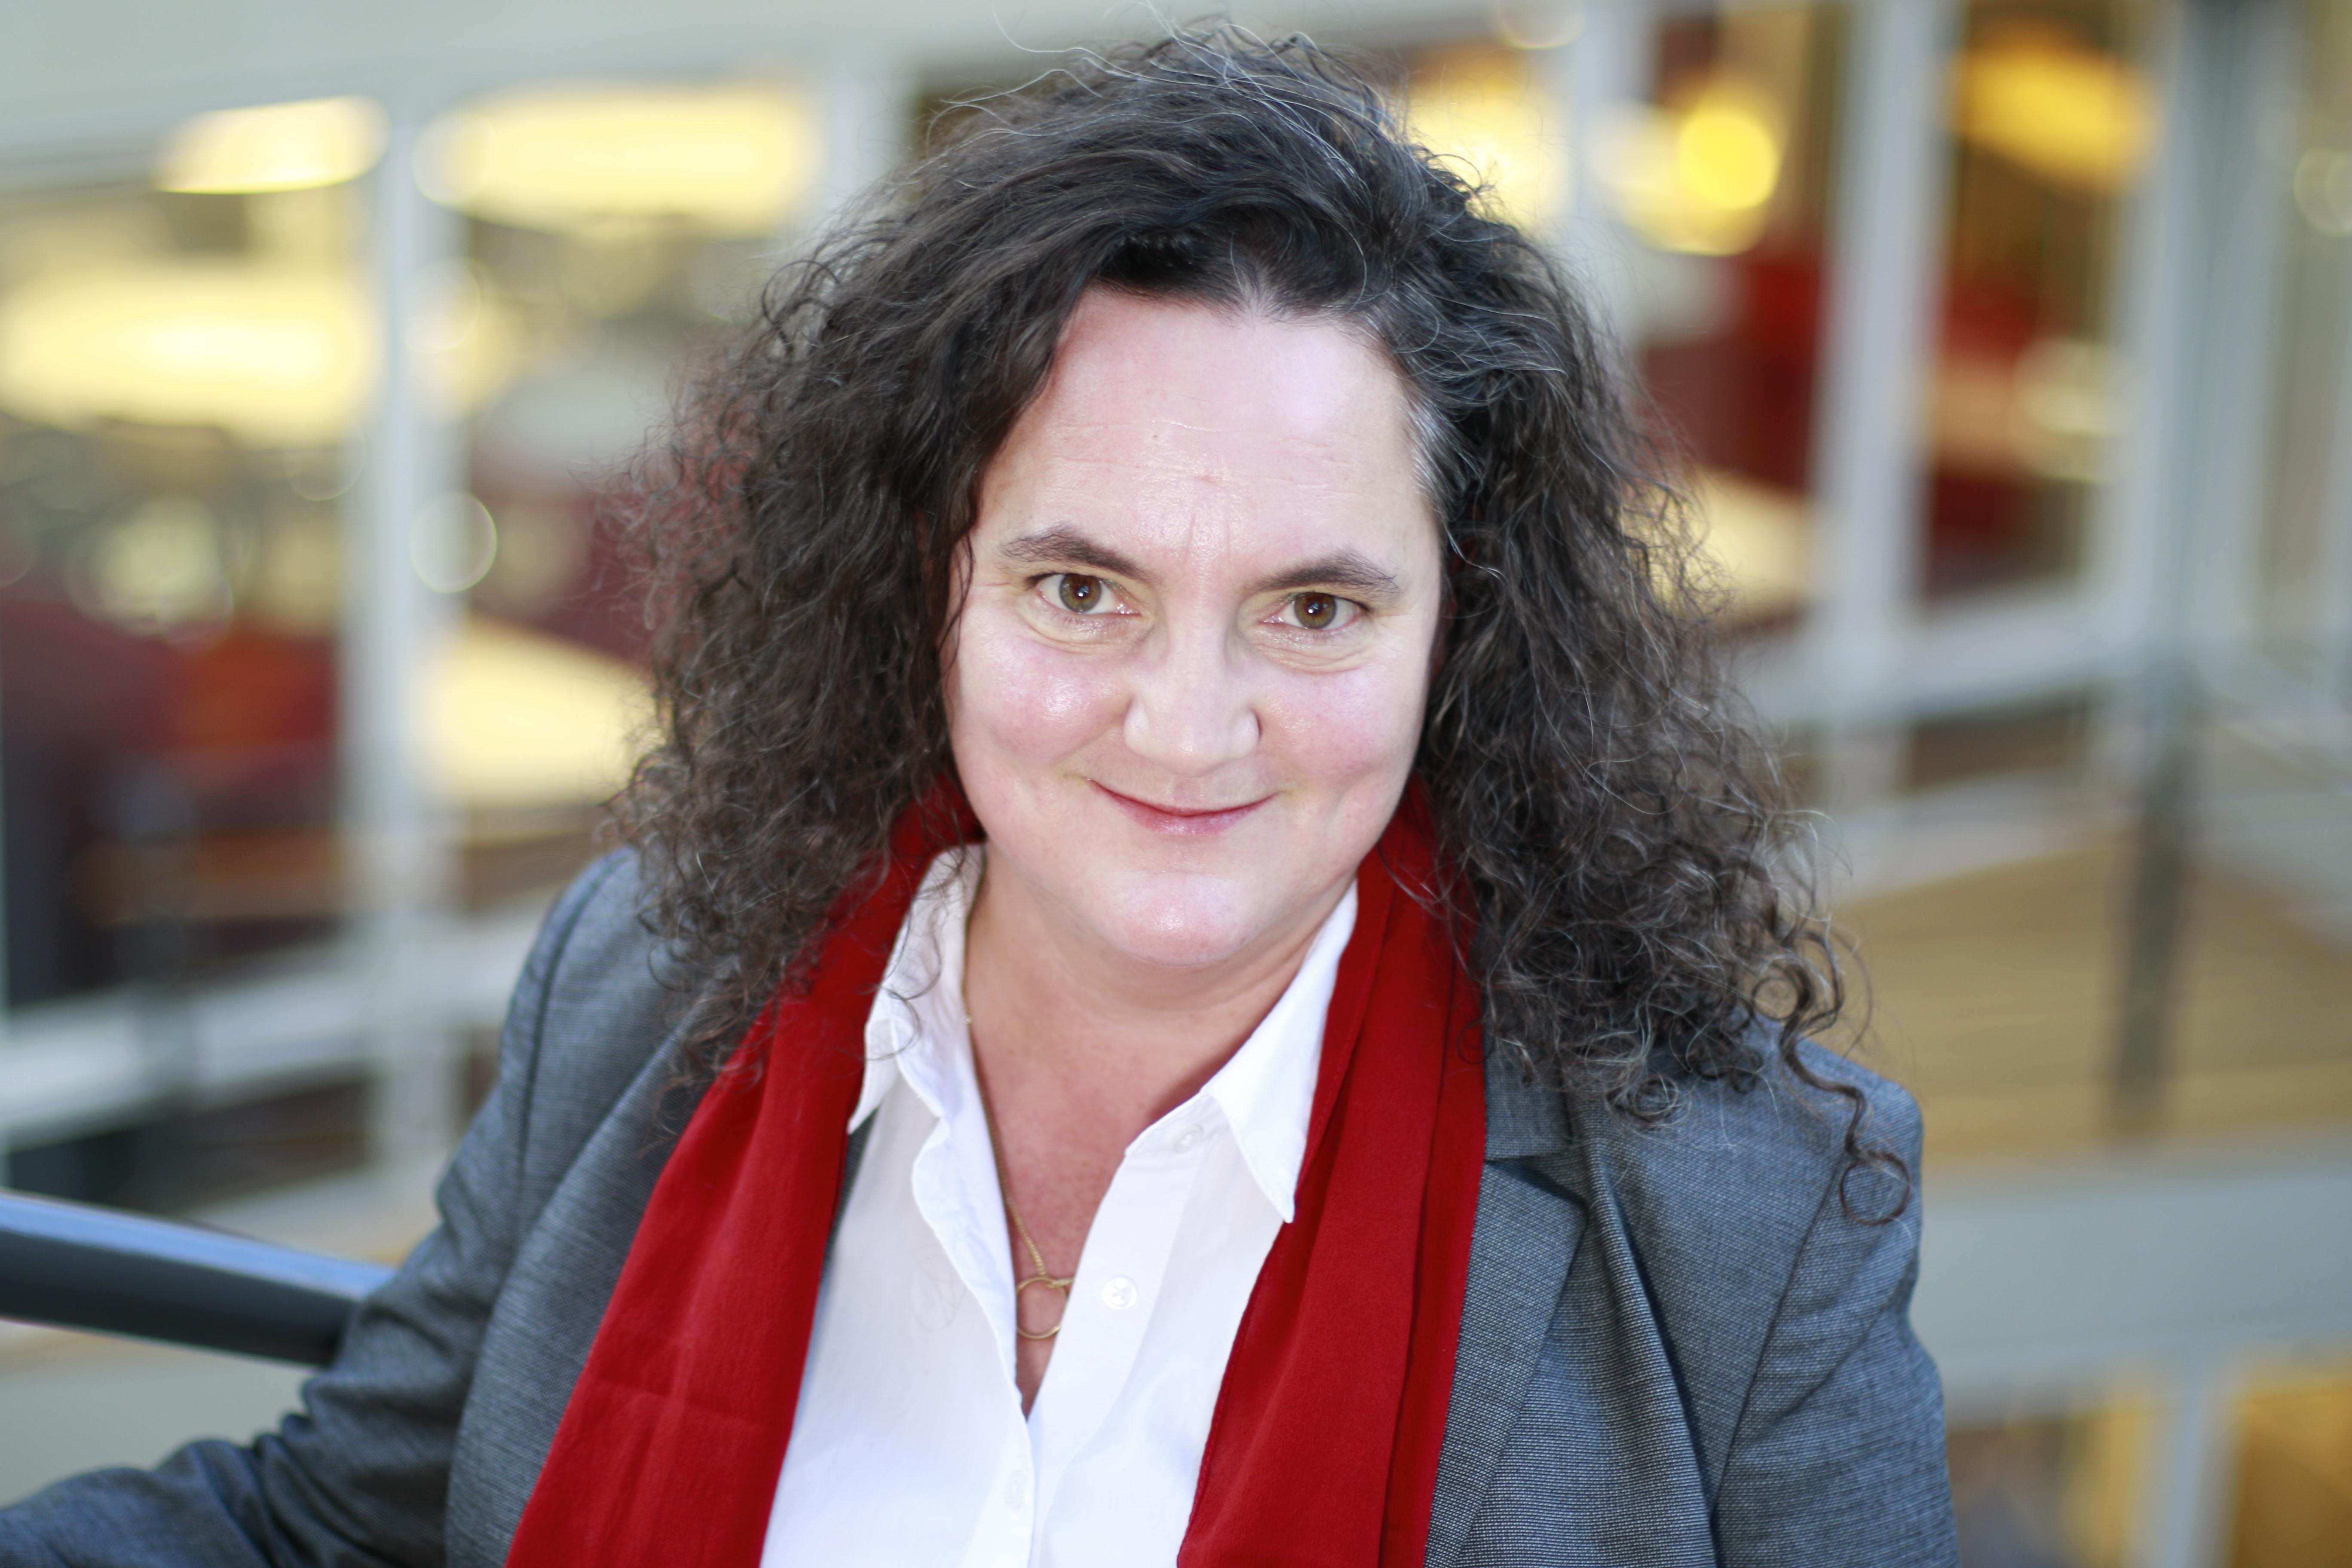 Anna Kelly